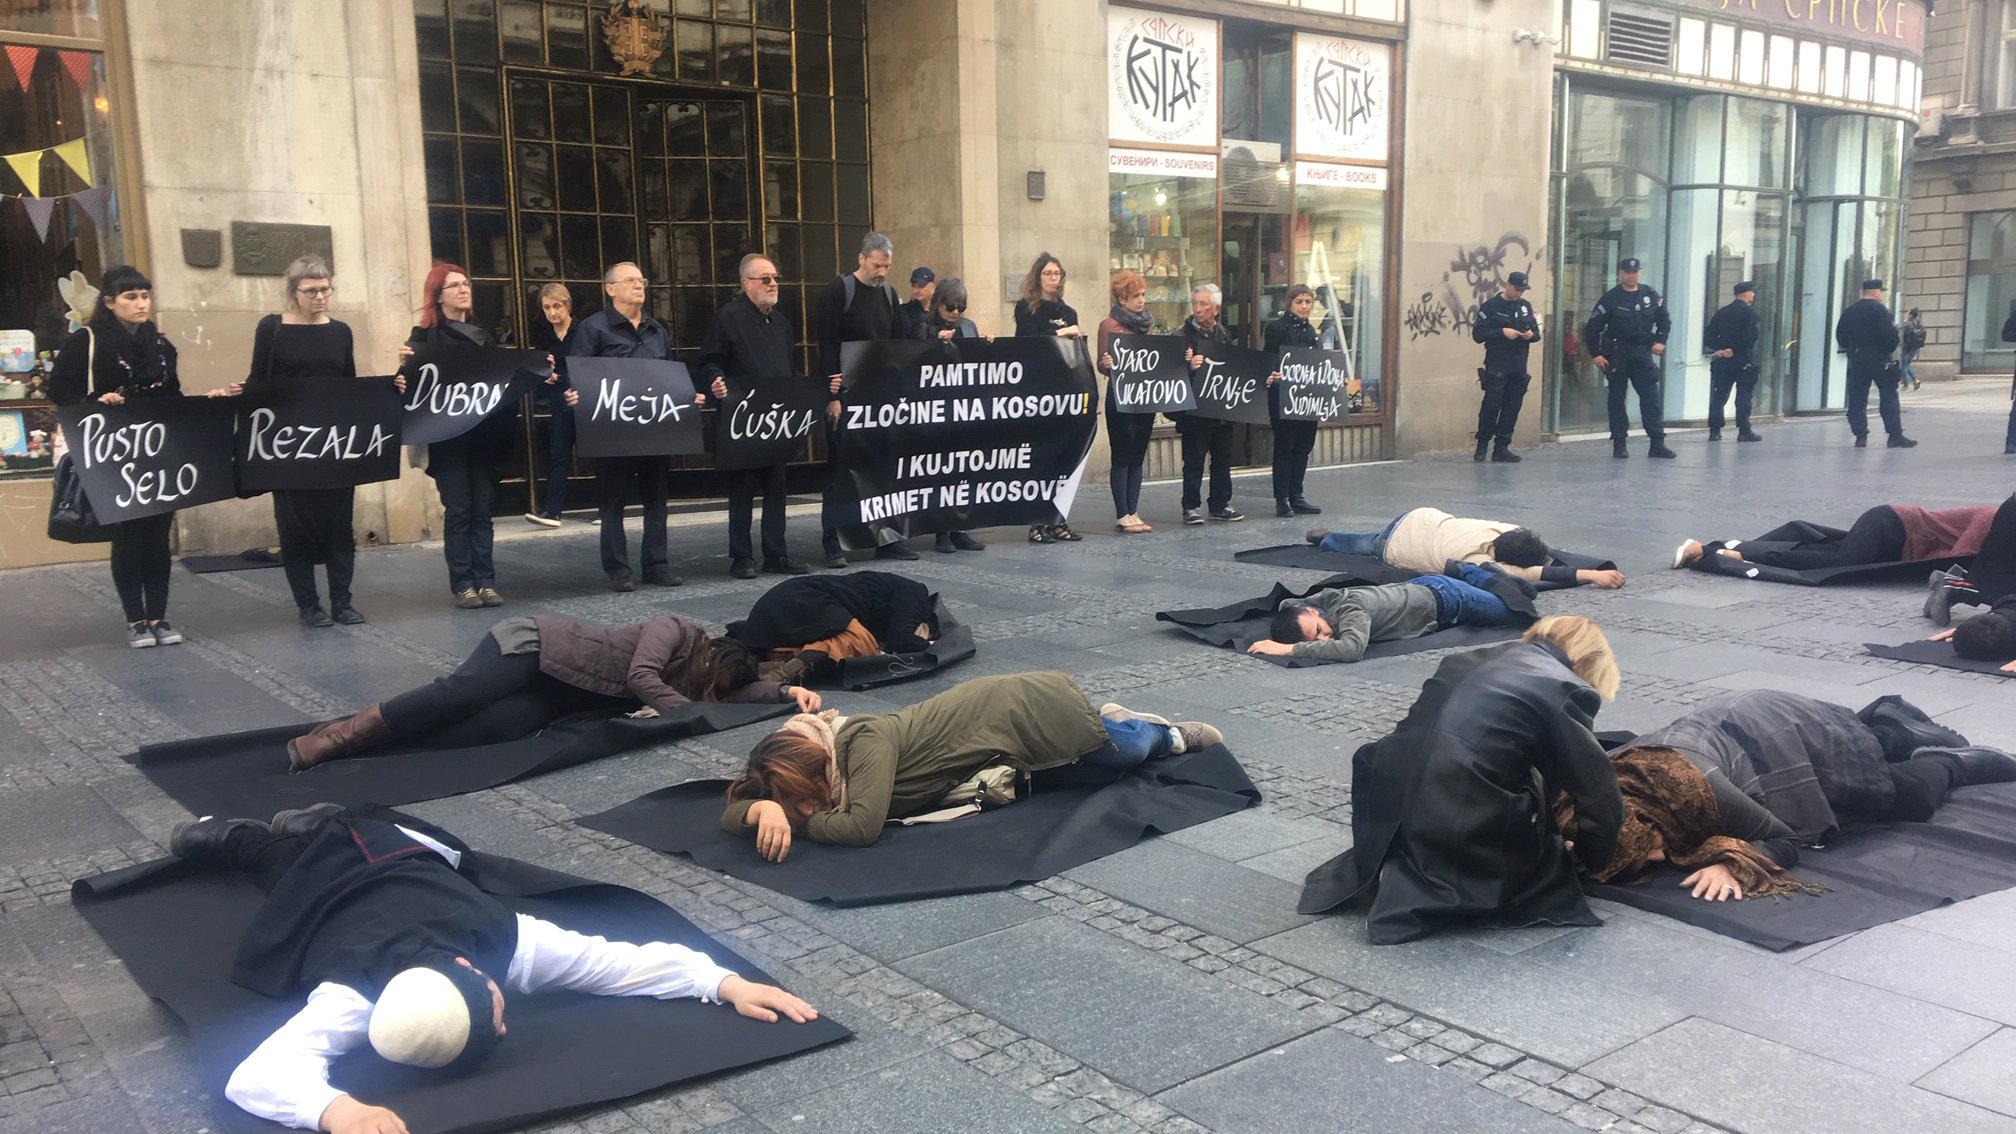 Javna akcija povodom 20 godina od zločina nad albanskim civilima na Kosovu 1